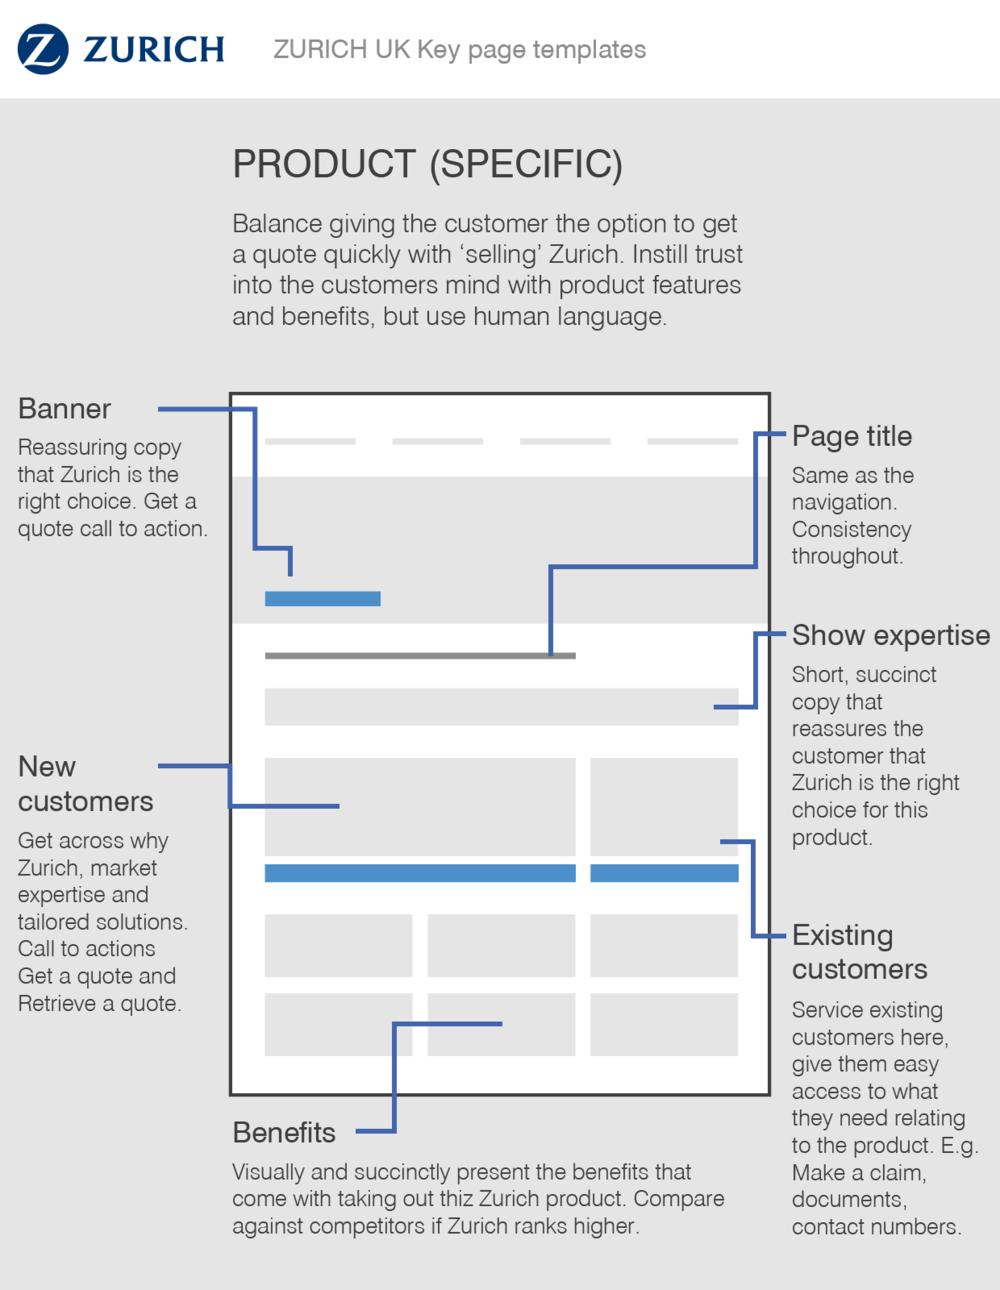 Key page templates